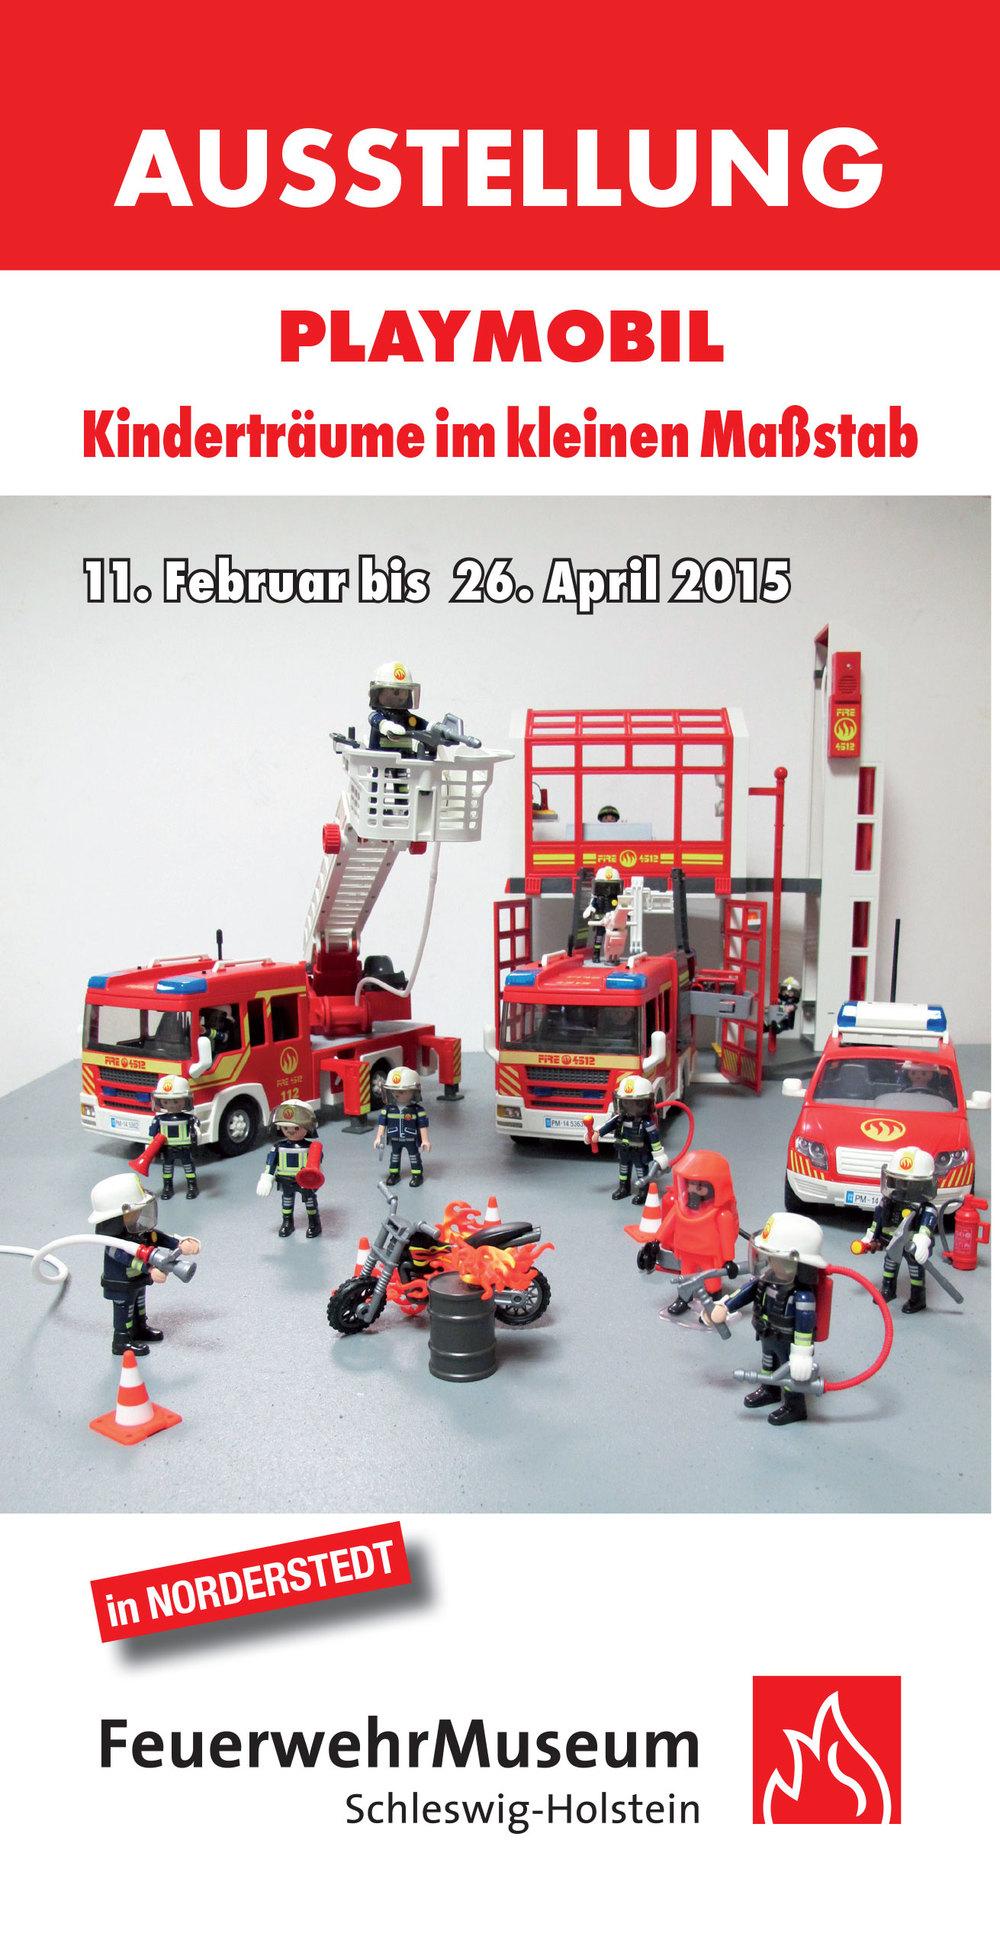 Flyer zur Playmobil-Ausstellung